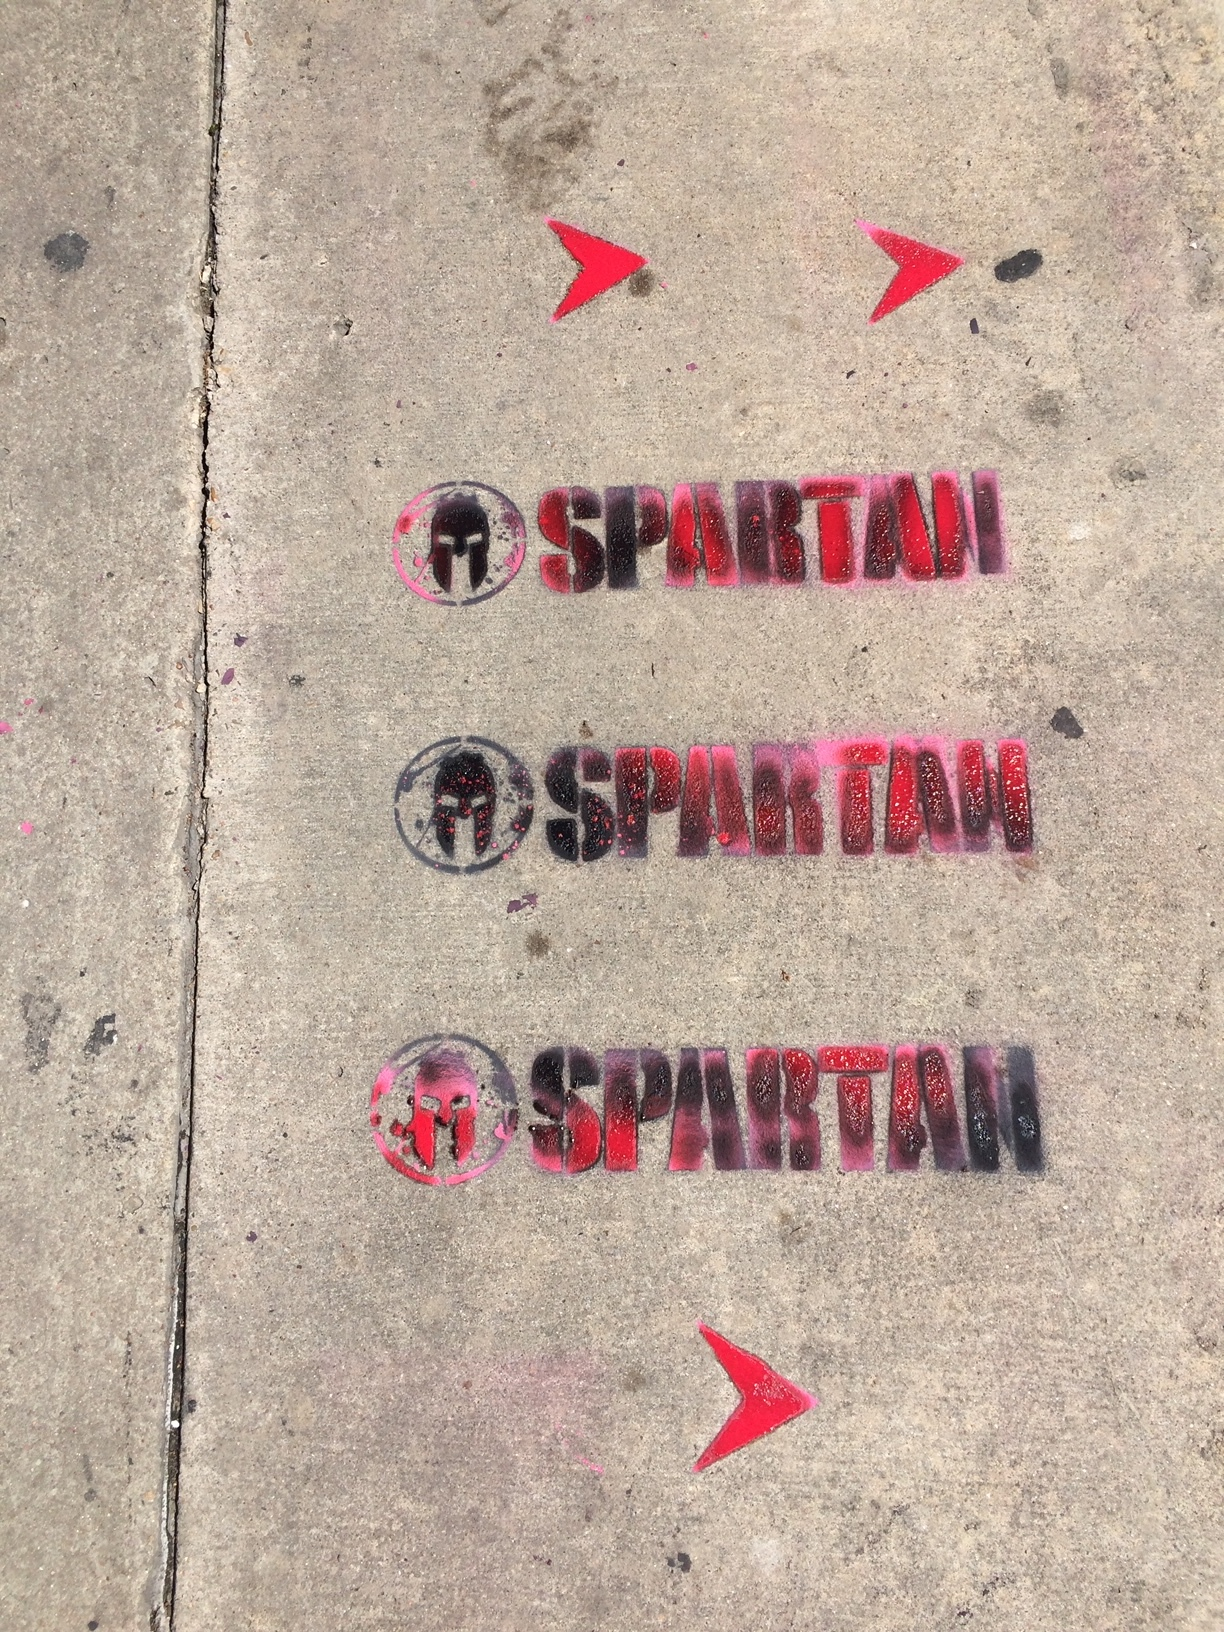 temporary chalk art tagging